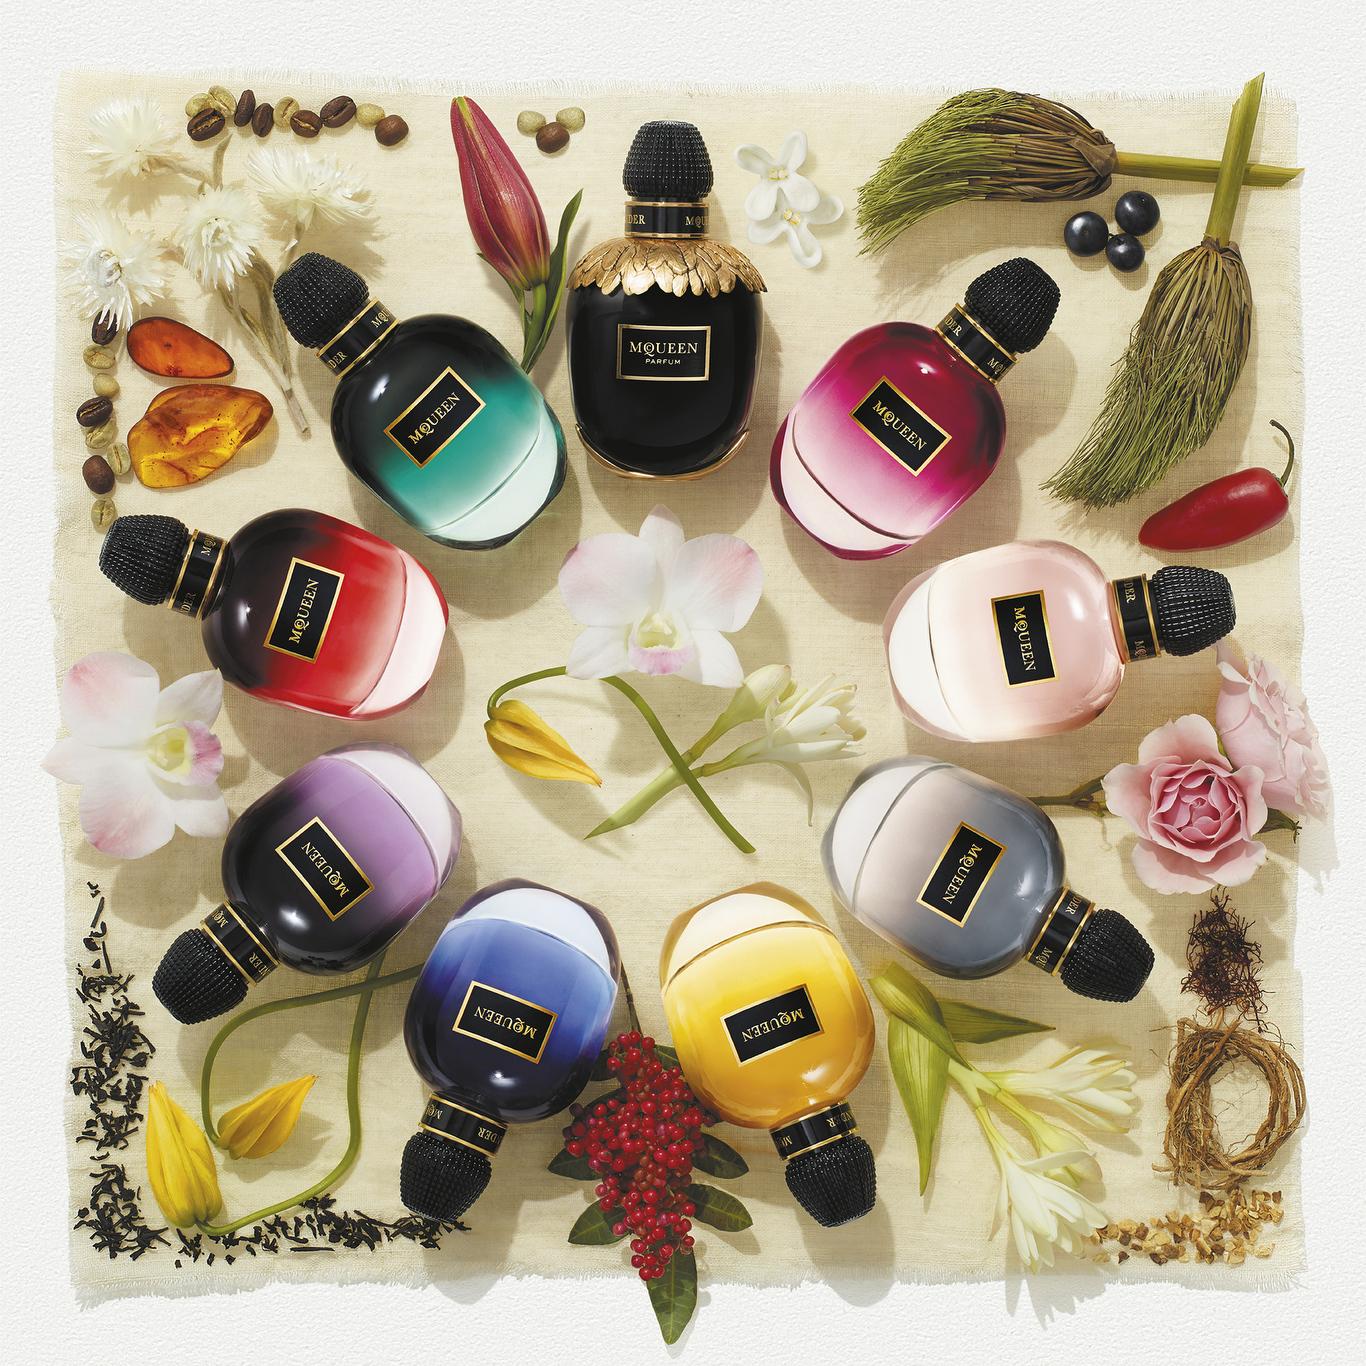 Alexander McQueen's New Collection of Eight Fragrances